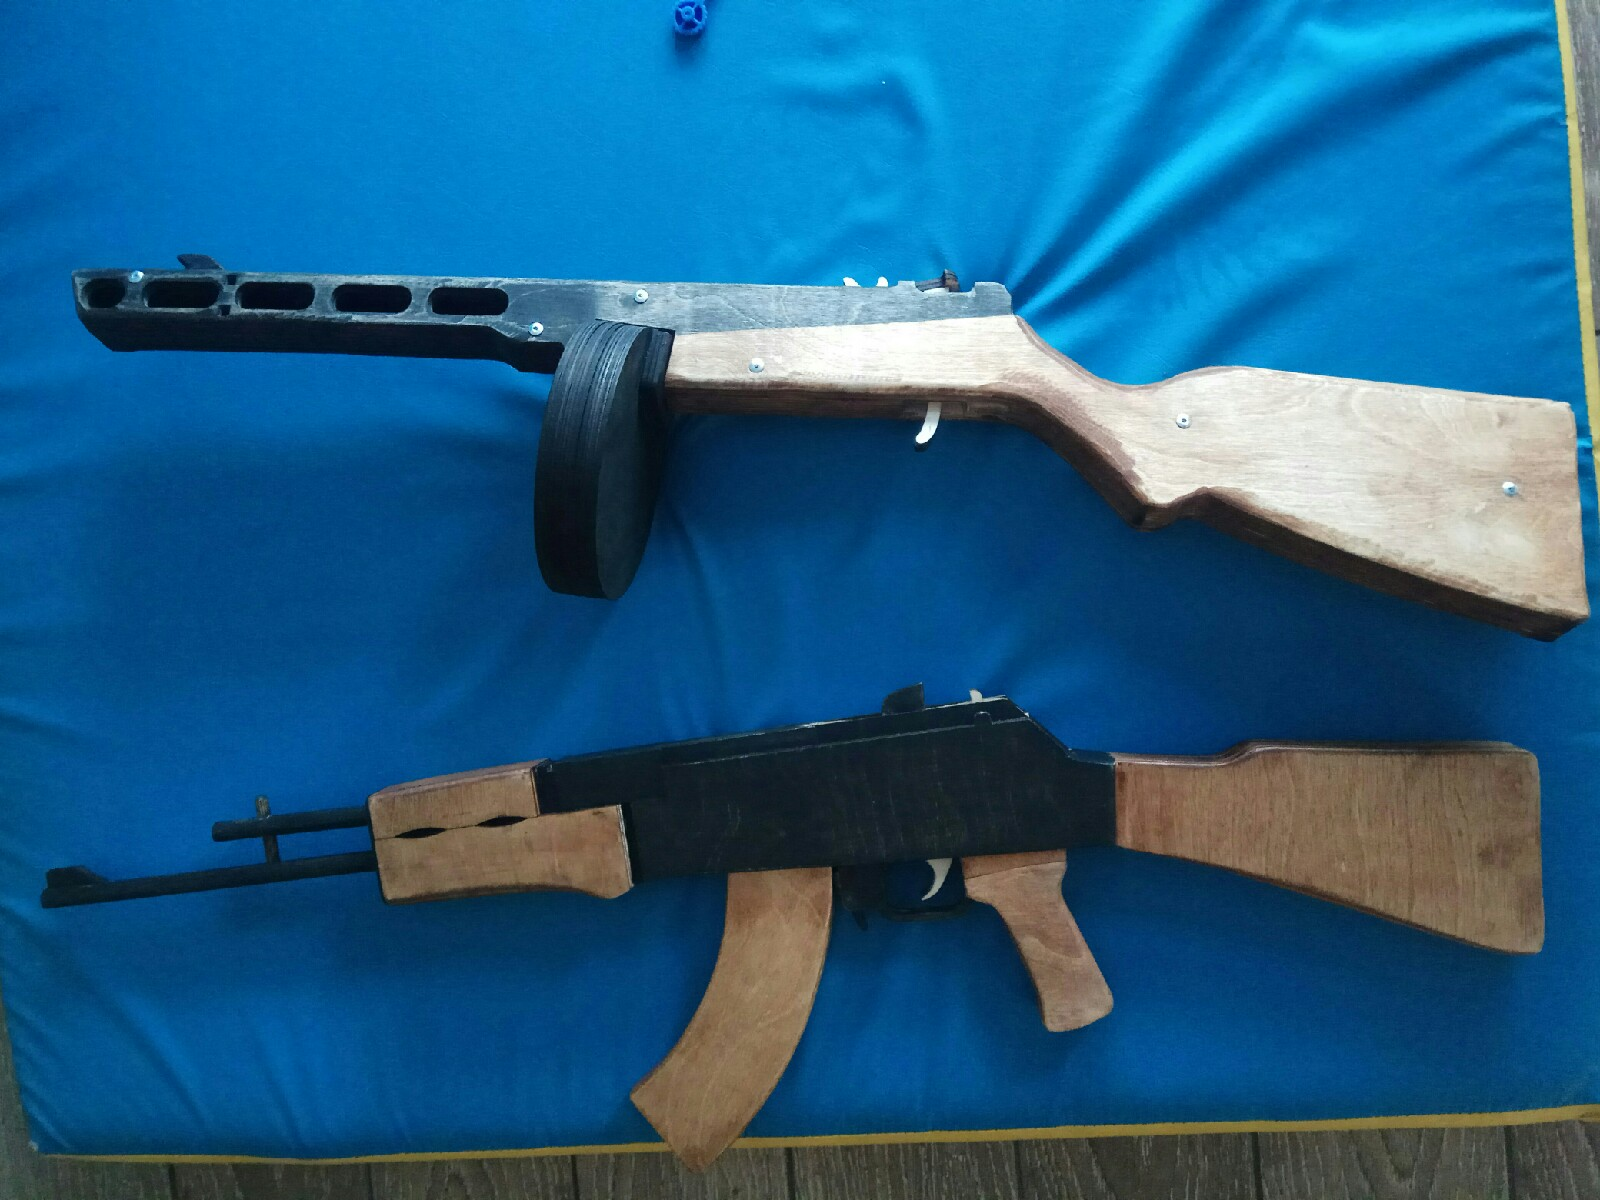 Laser Cut Wooden Toy Gun PPSh-41 Free Vector